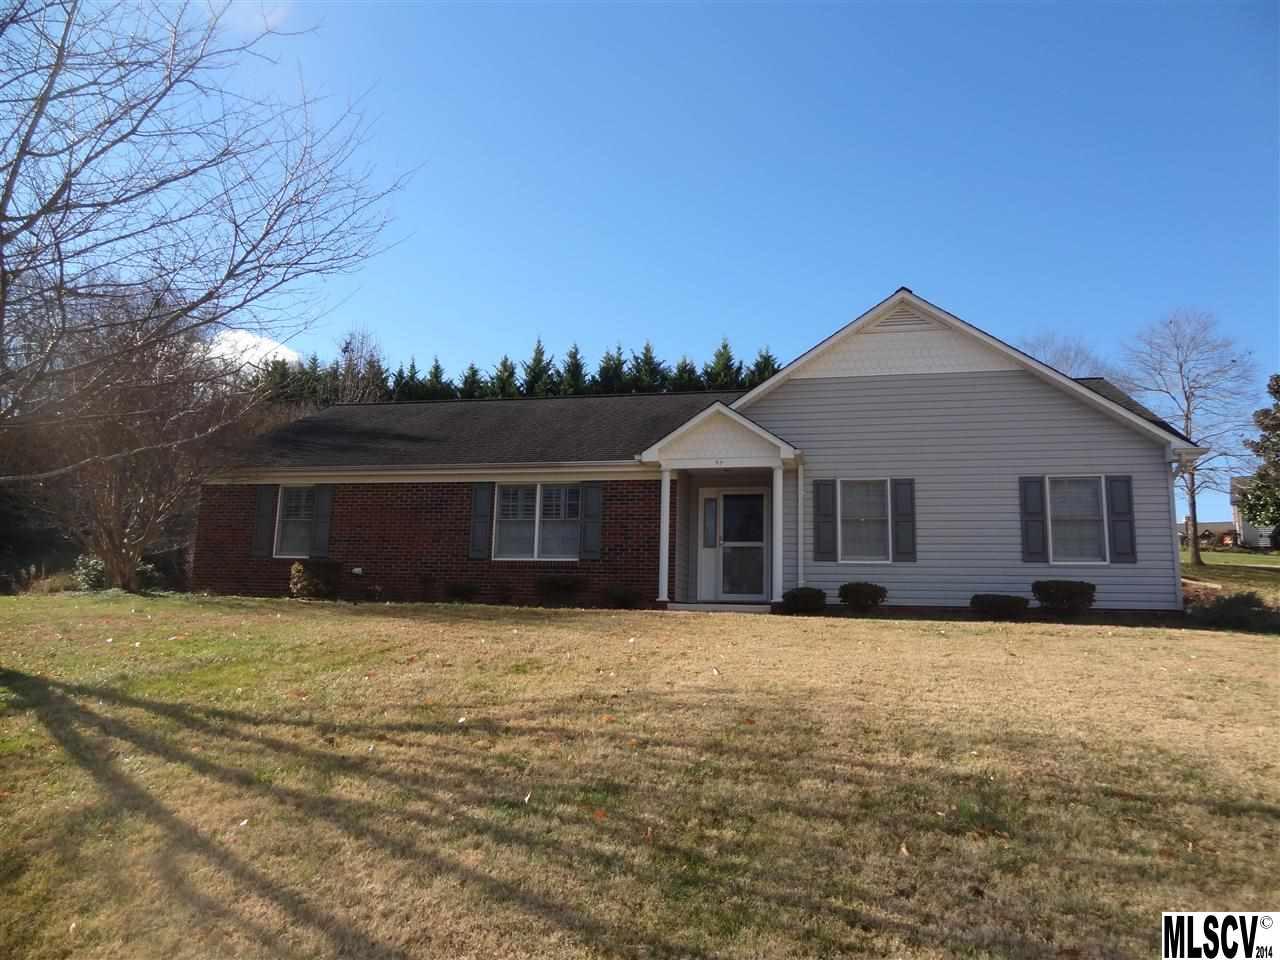 1352 Grady Ln, Hickory, NC 28602